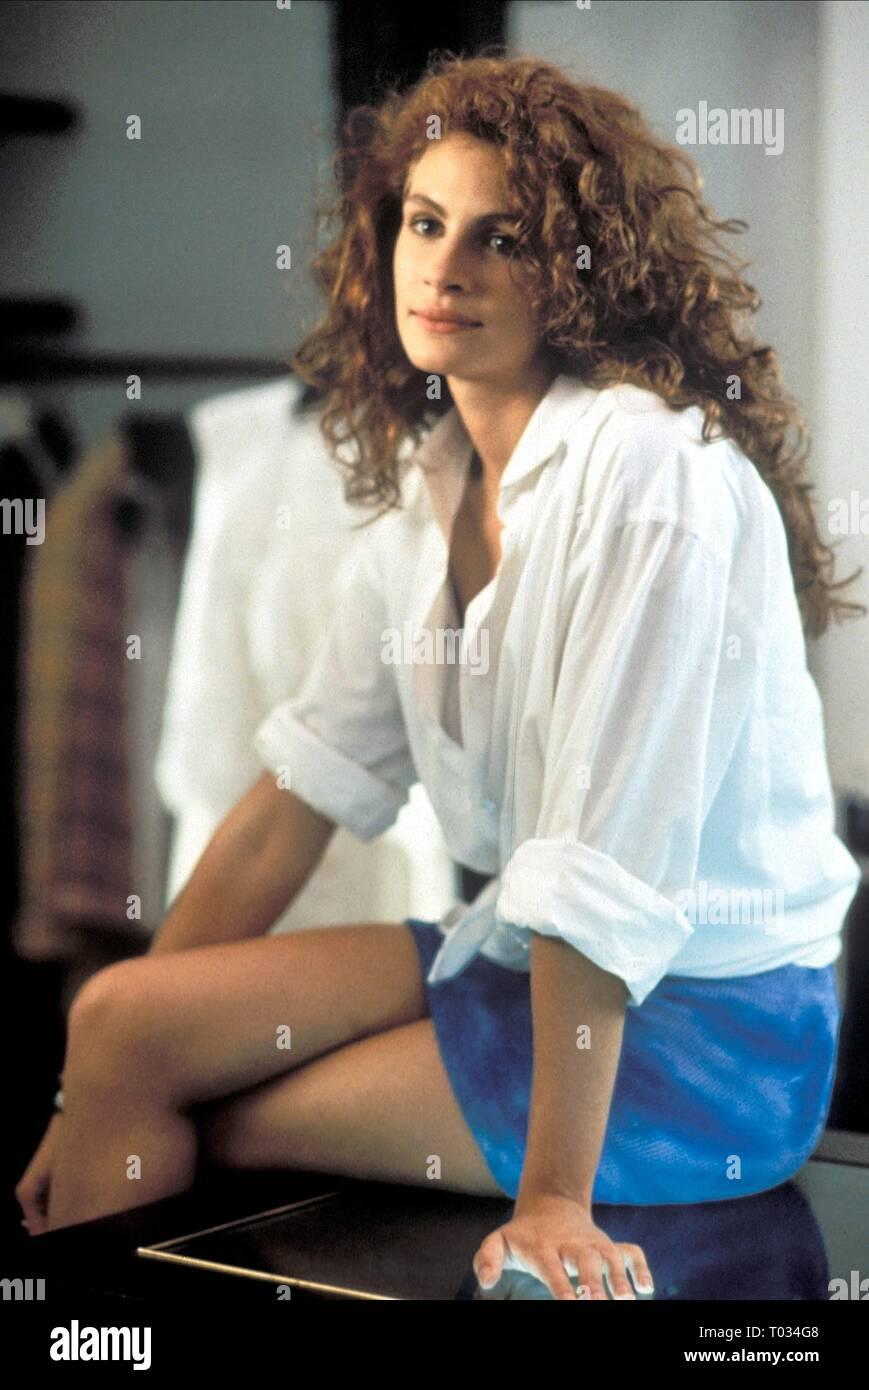 Julia Roberts Pretty Woman 1990 Stock Photo Alamy